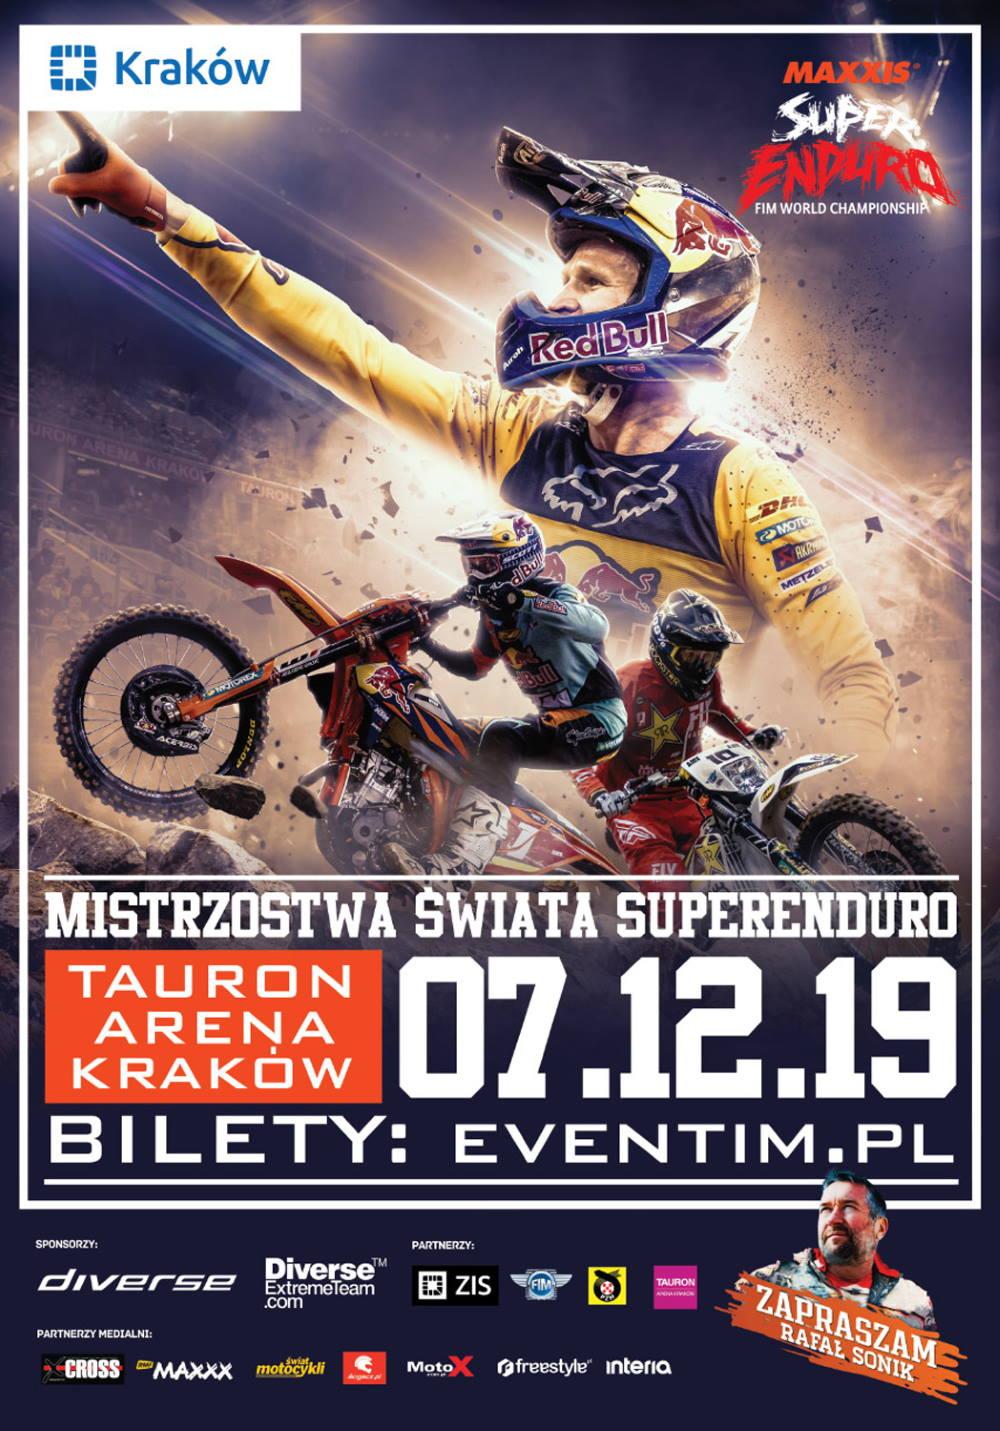 Plakat MŚ SuperEnduro 2019 - Kraków Tauron Arena